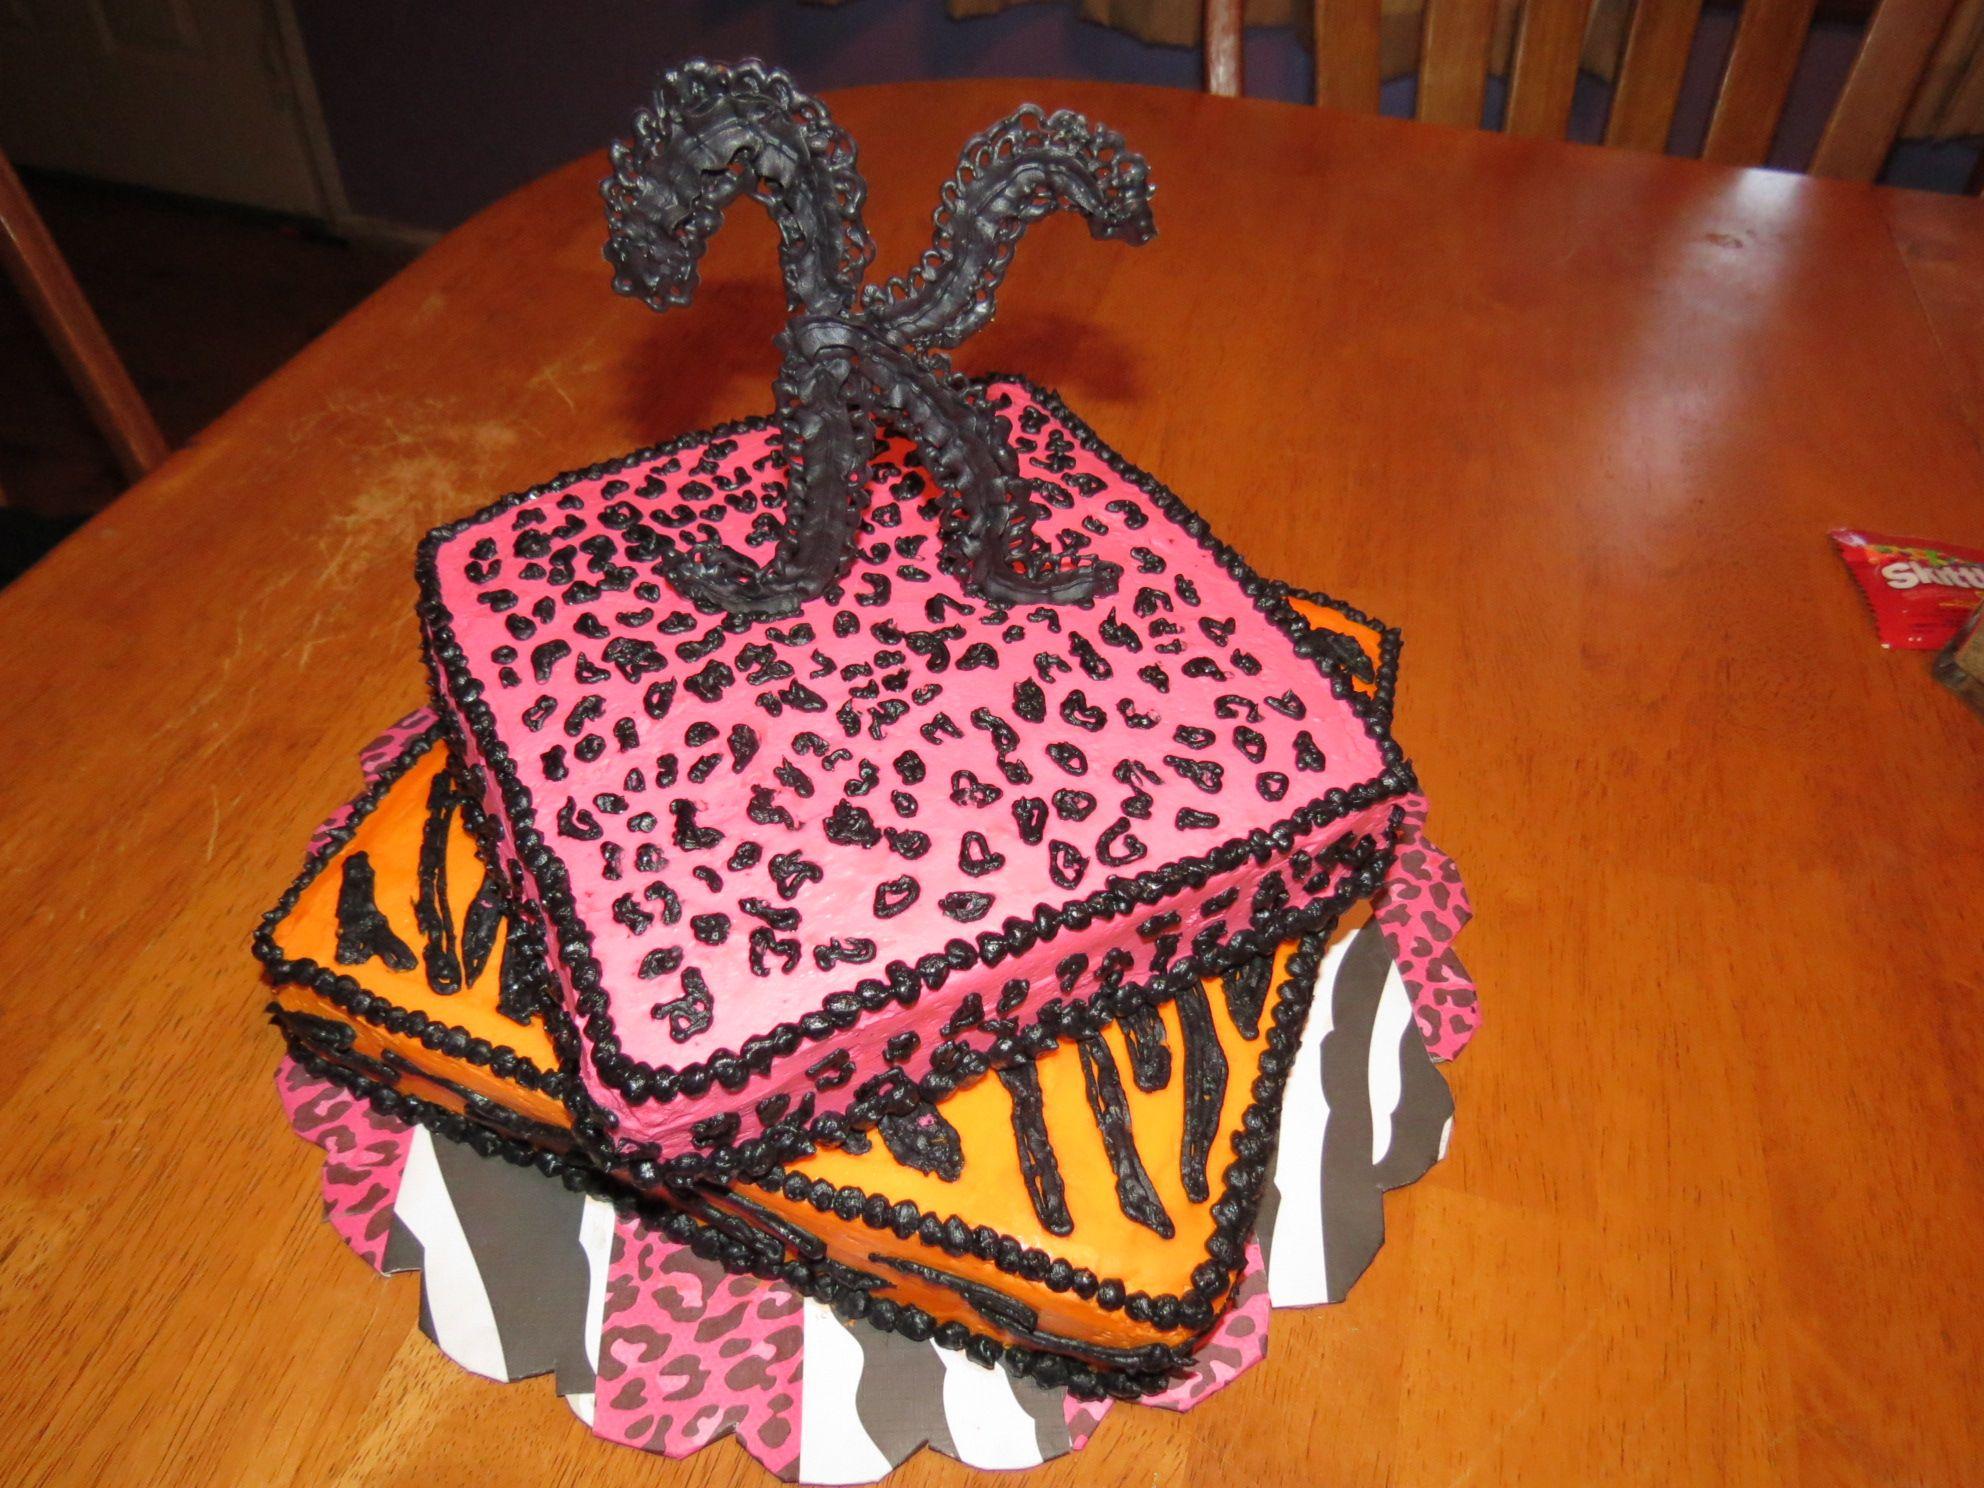 10 Year Old Boy Birthday Cake Ideas 85776 10 Year Old Birt